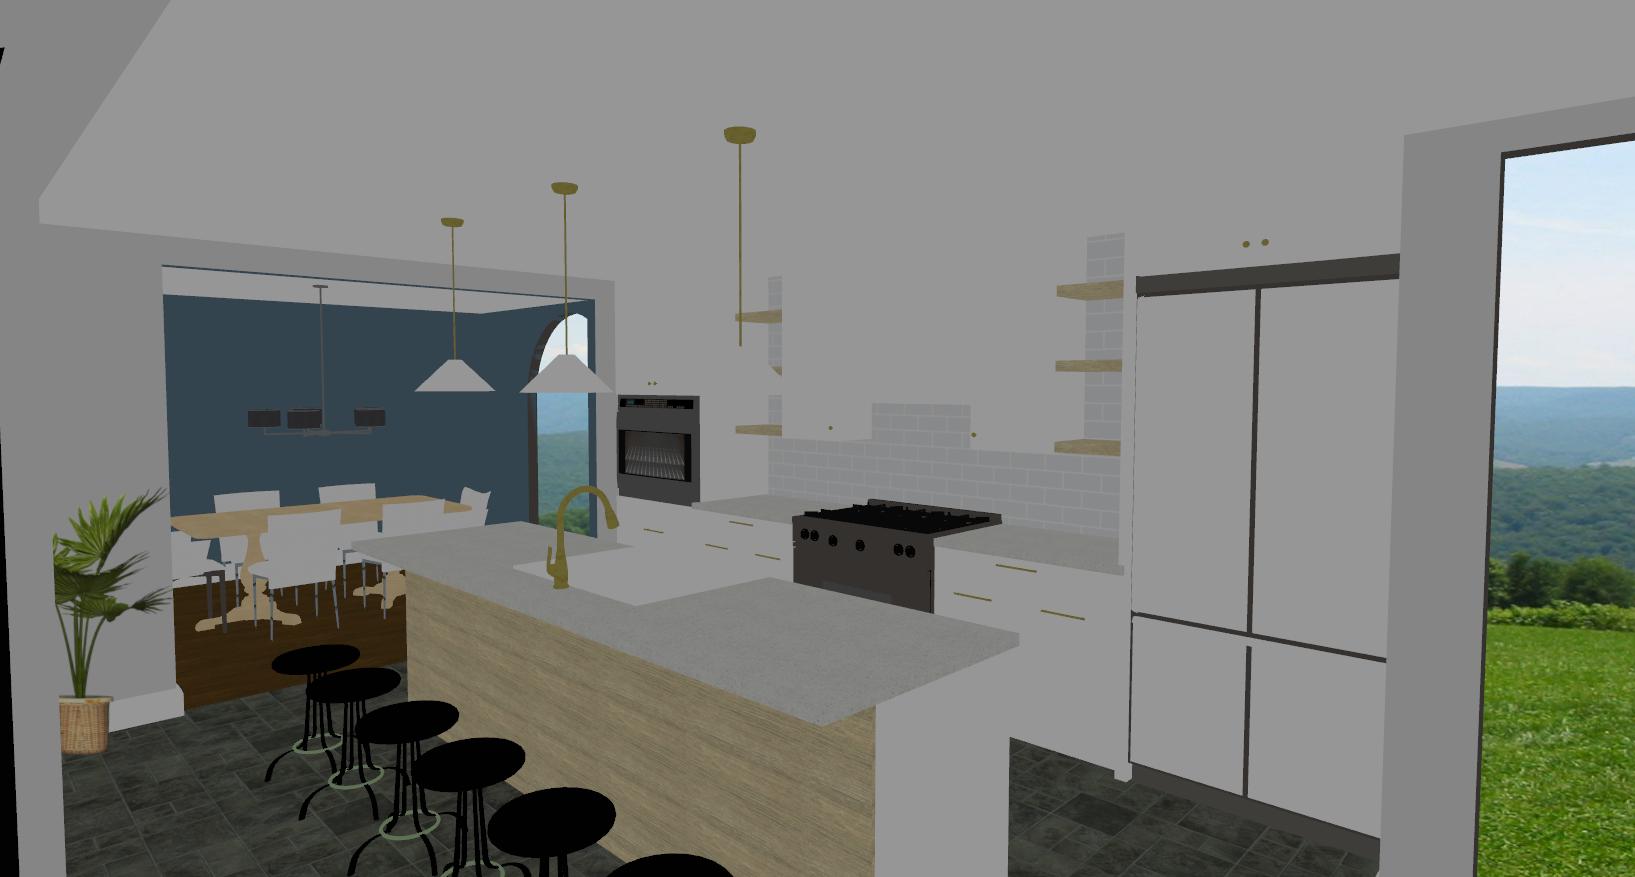 Hewlett Kitchen Open Shelving - Render 2.png